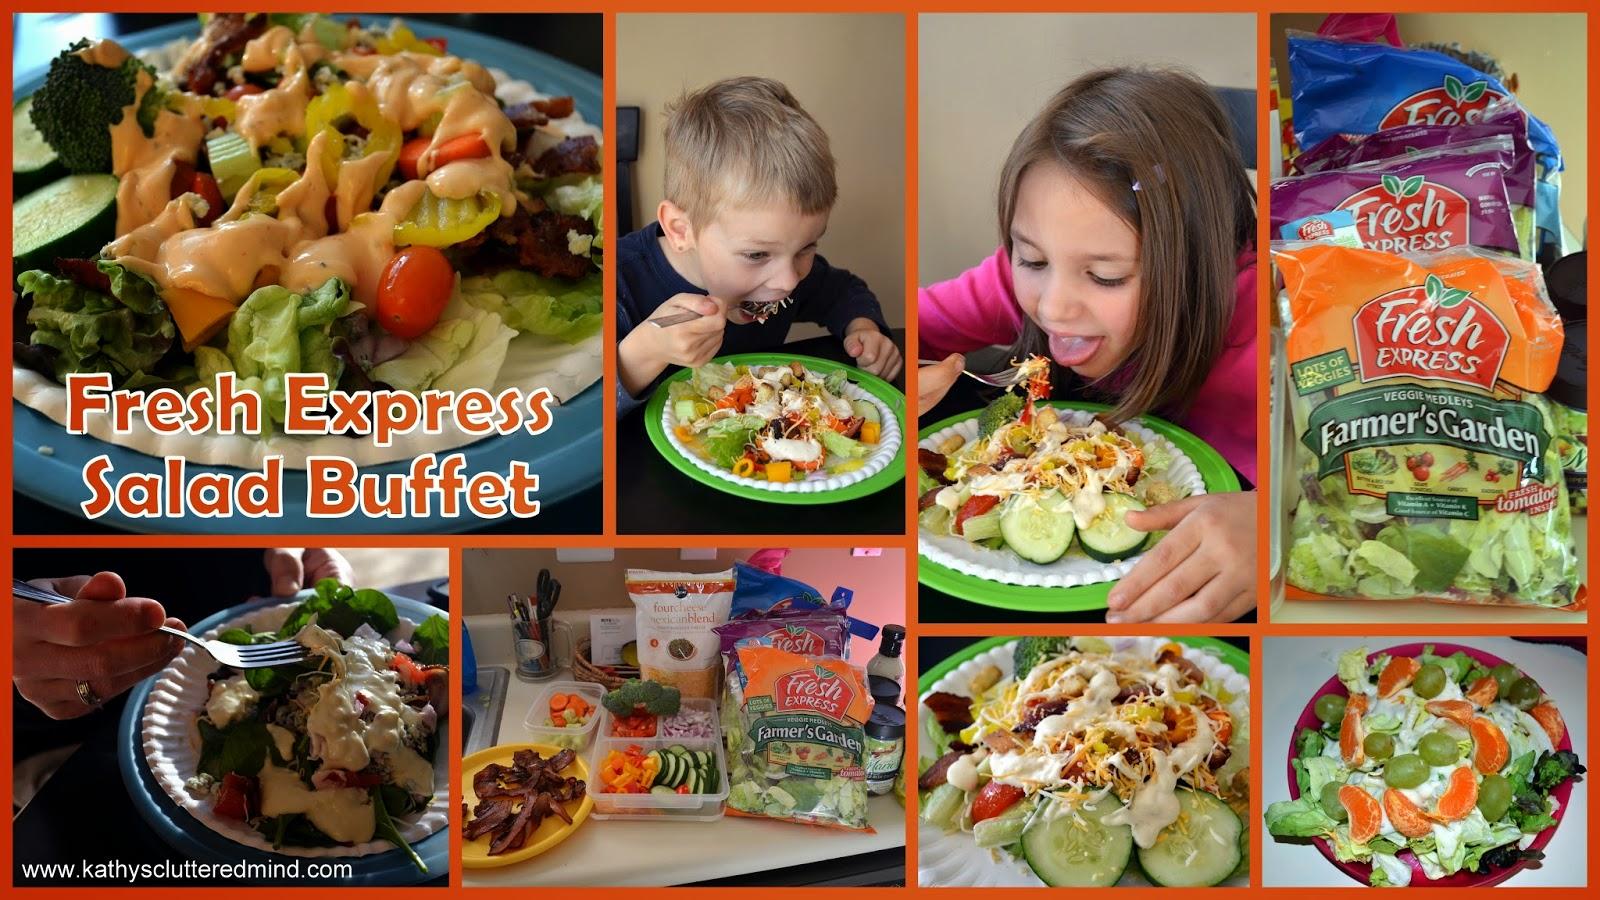 Kathys Cluttered Mind: Fresh Express Salad - Fresh, Healthy